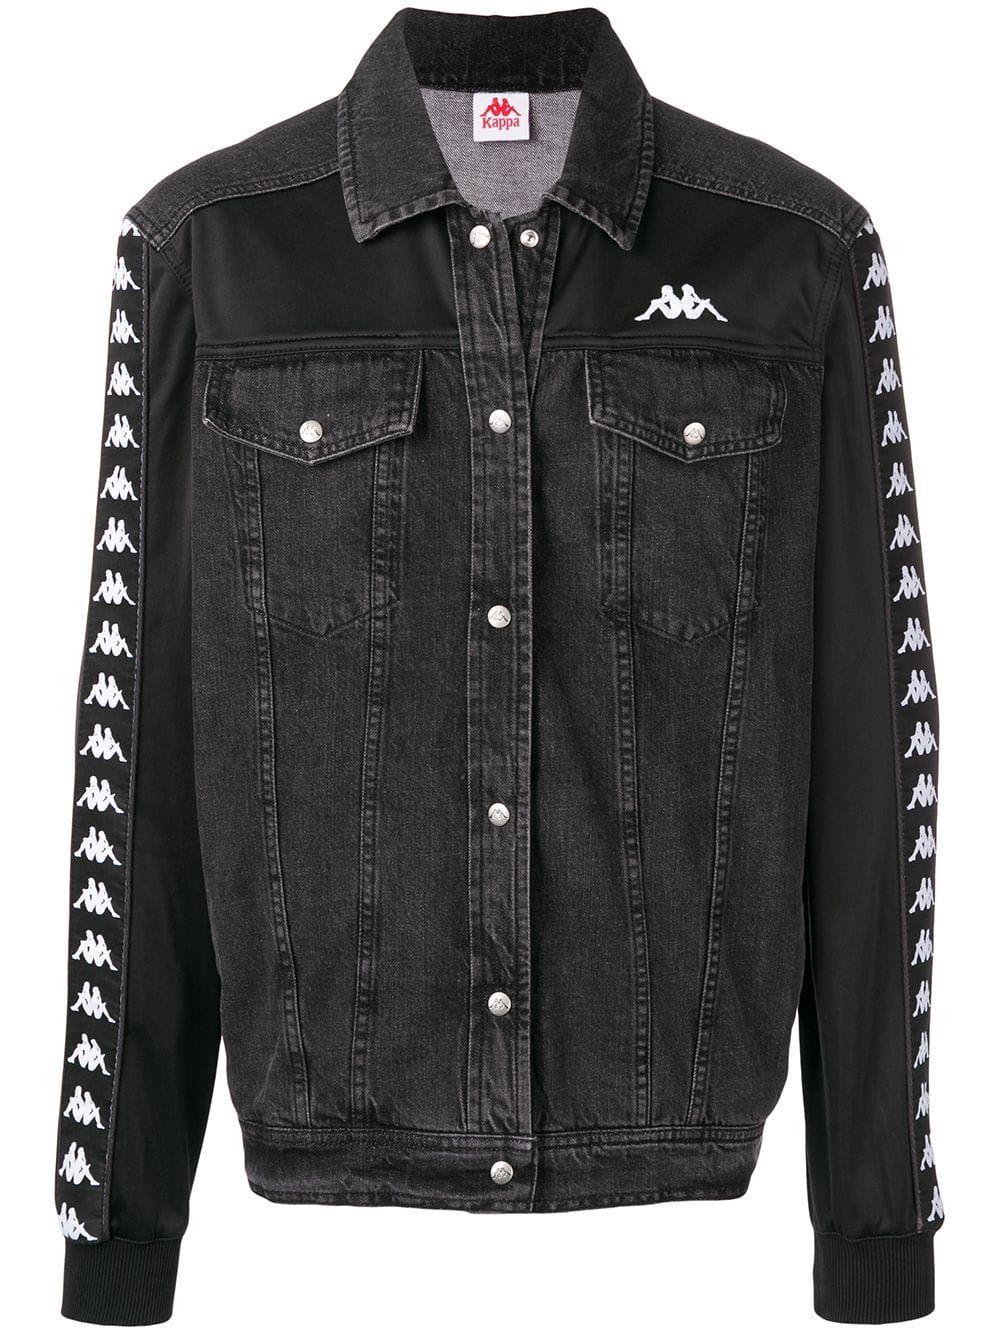 Kappa Side Logo Stripe Jacket In Black Modesens Striped Jacket Kappa Clothing Jackets [ 1334 x 1000 Pixel ]